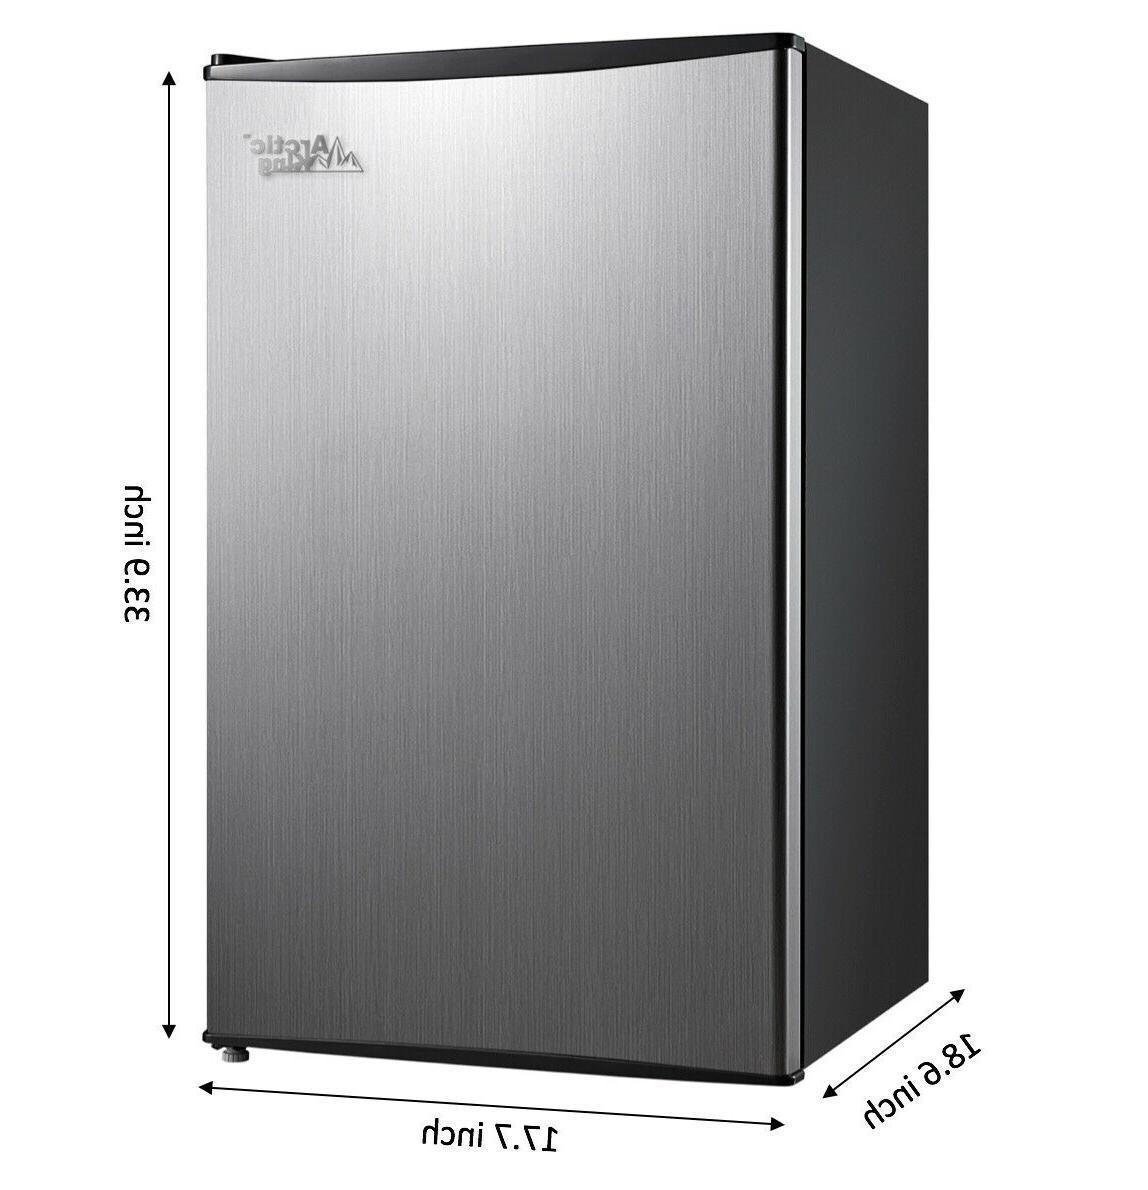 Mini Fridge Refrigerator Door 3.3 Cu.ft Stainless